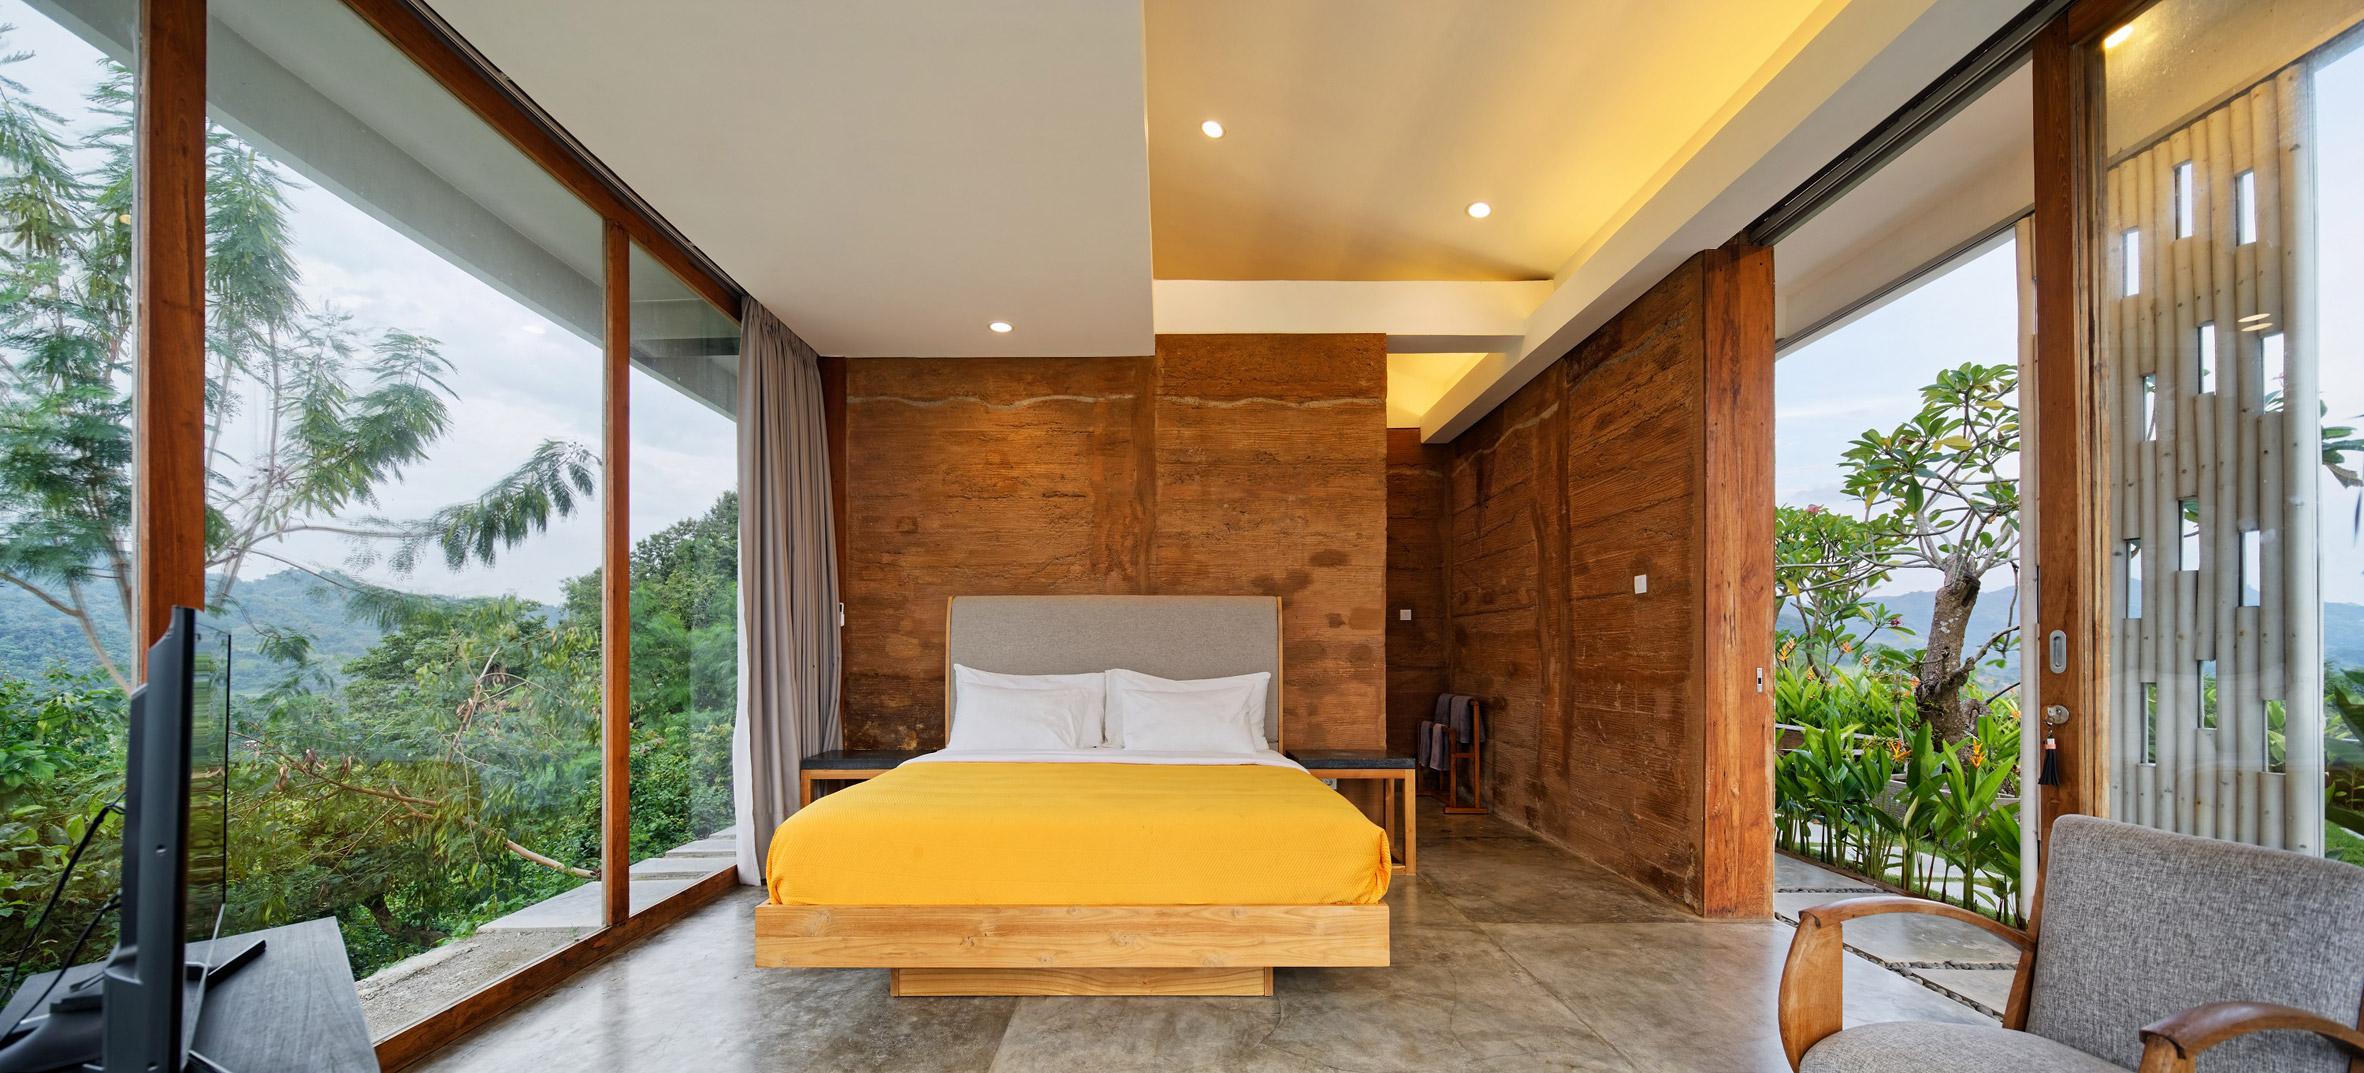 clay-house-budi-pradono-architects-architecture_dezeen_2364_col_9.jpg